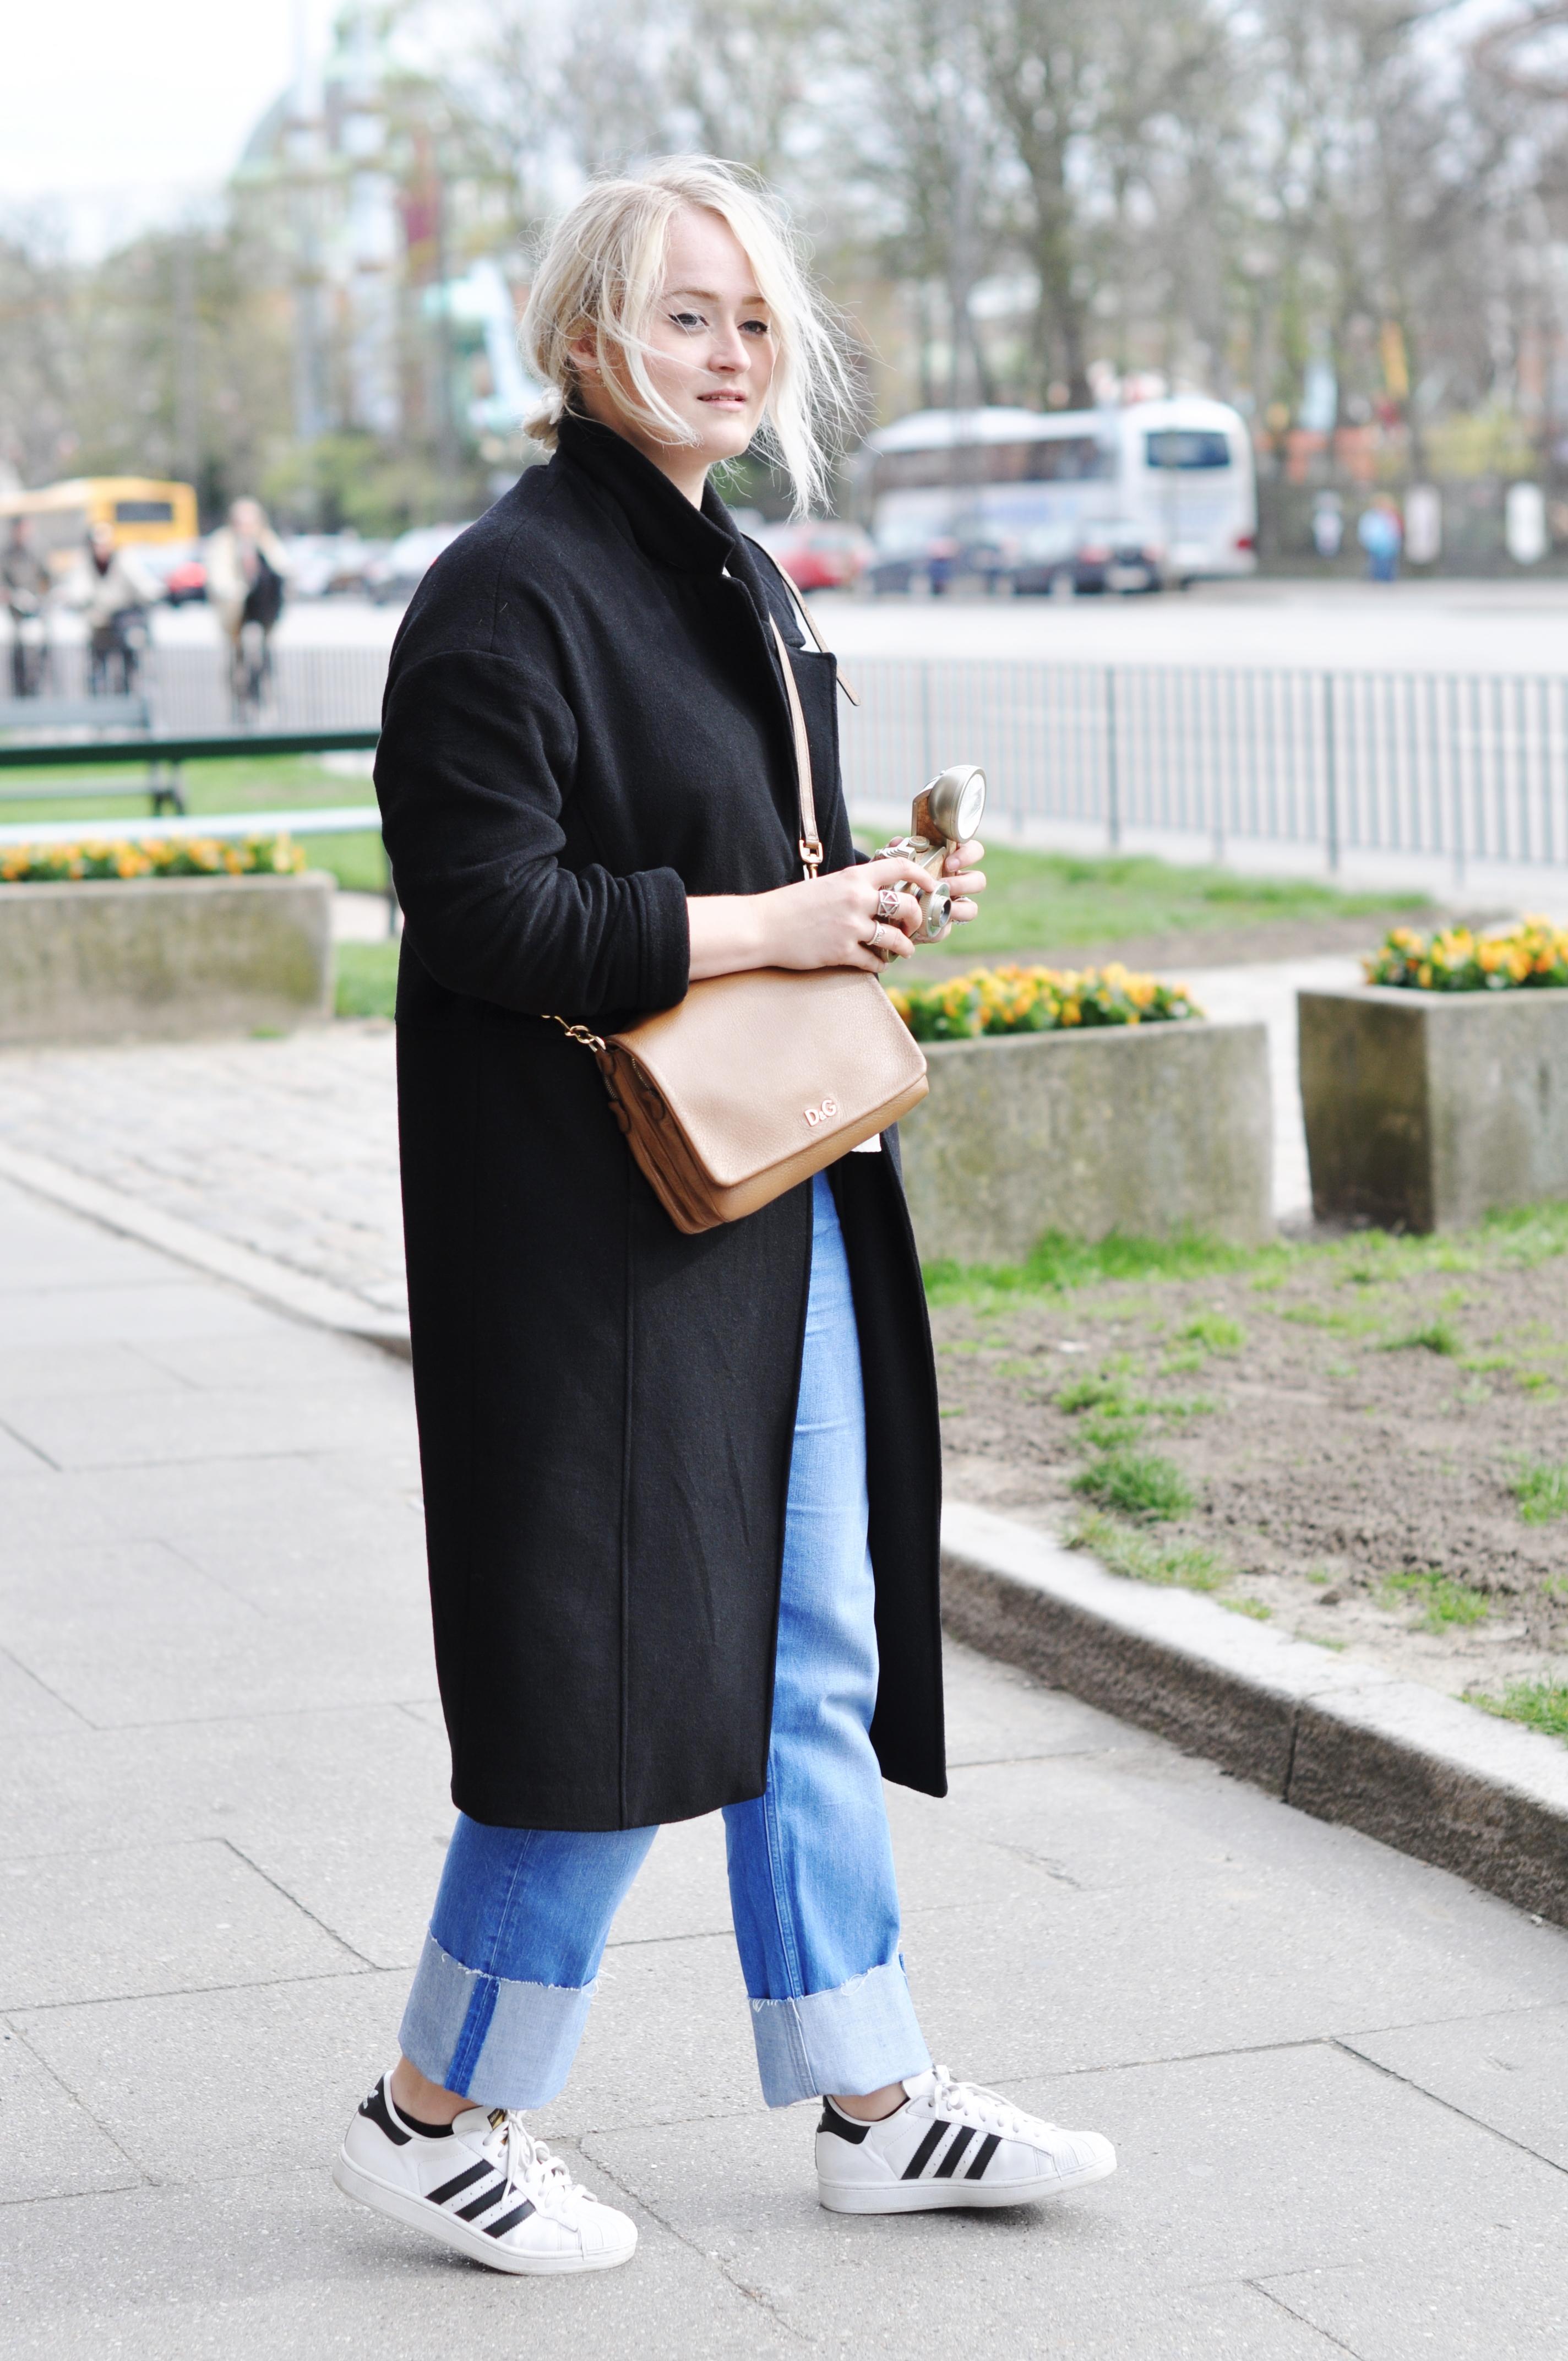 Vestito di copenaghen mih phoebe jeans boyfriendjeans adidas superstar